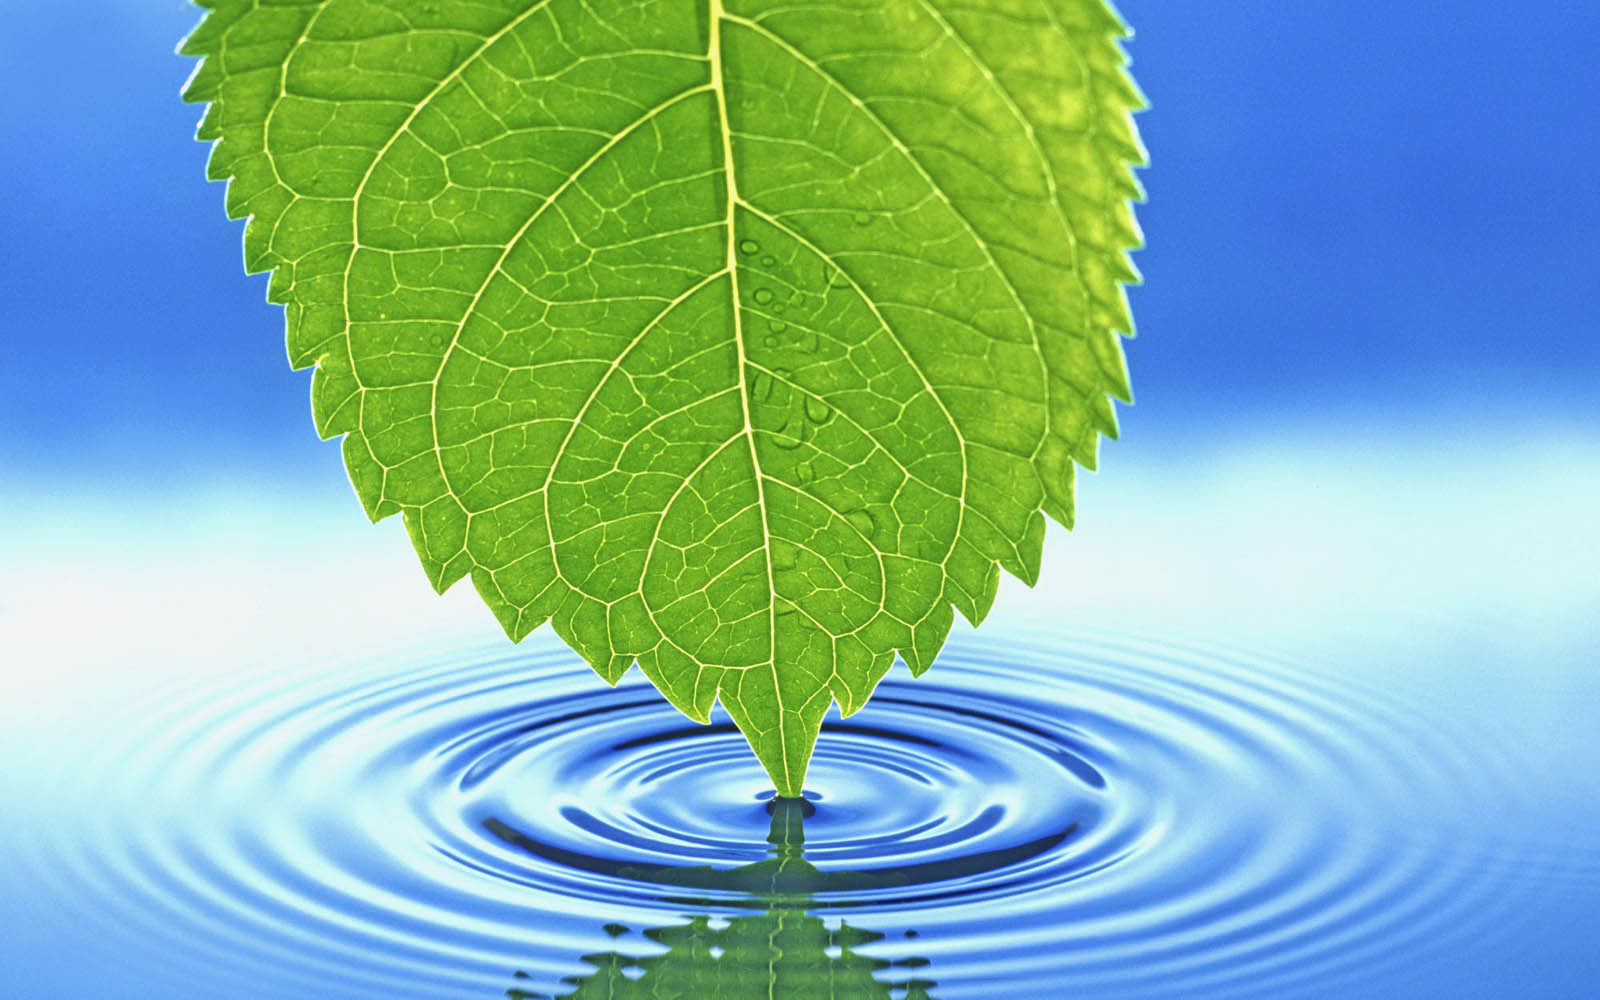 green leaf wallpaper image - photo #19